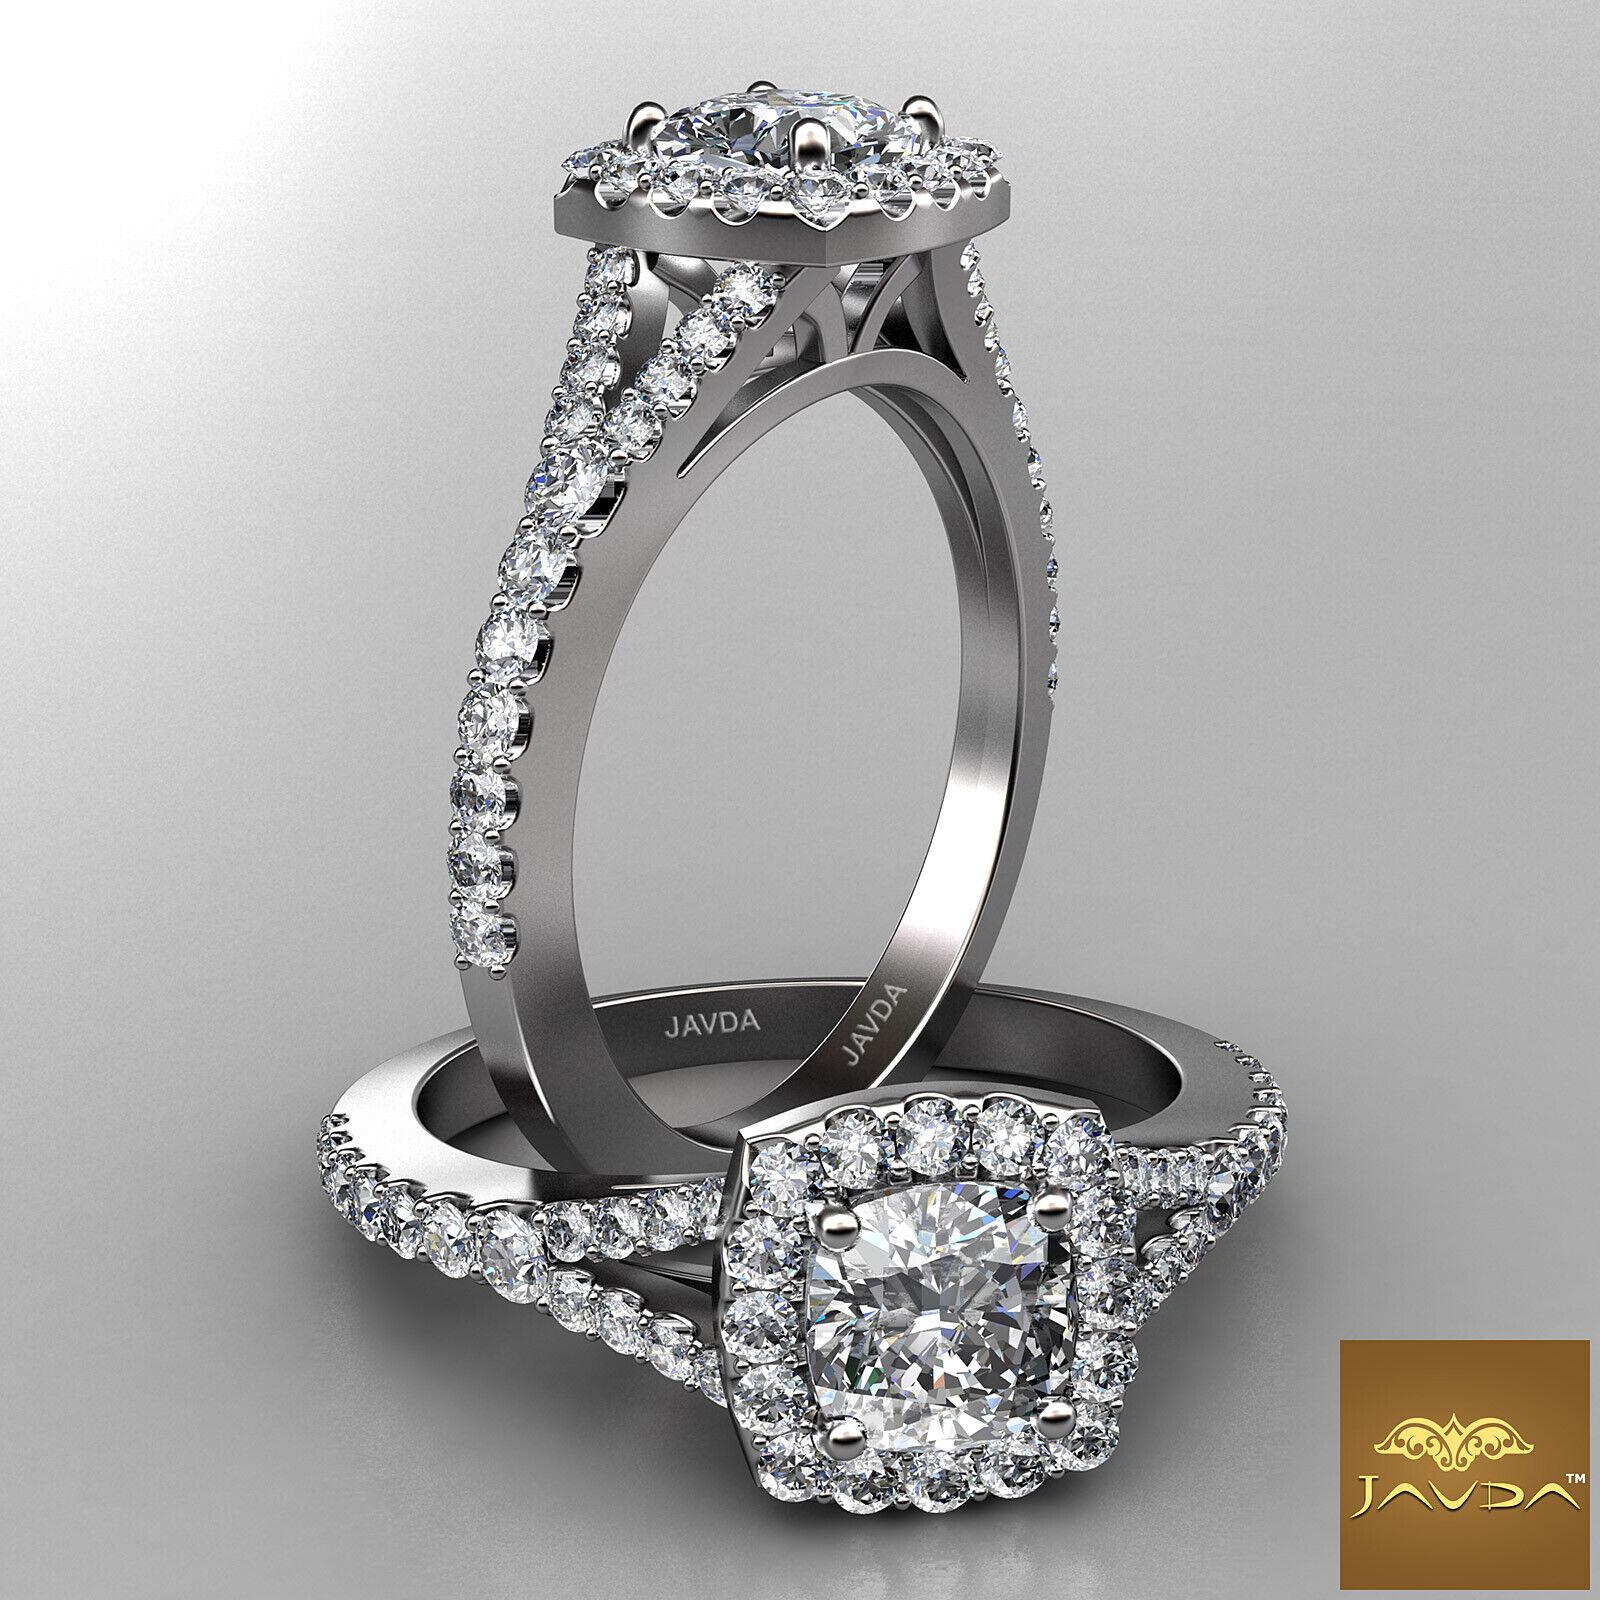 Halo Split Shank Prong Setting Cushion Cut Diamond Engagement Ring GIA F VS1 1Ct